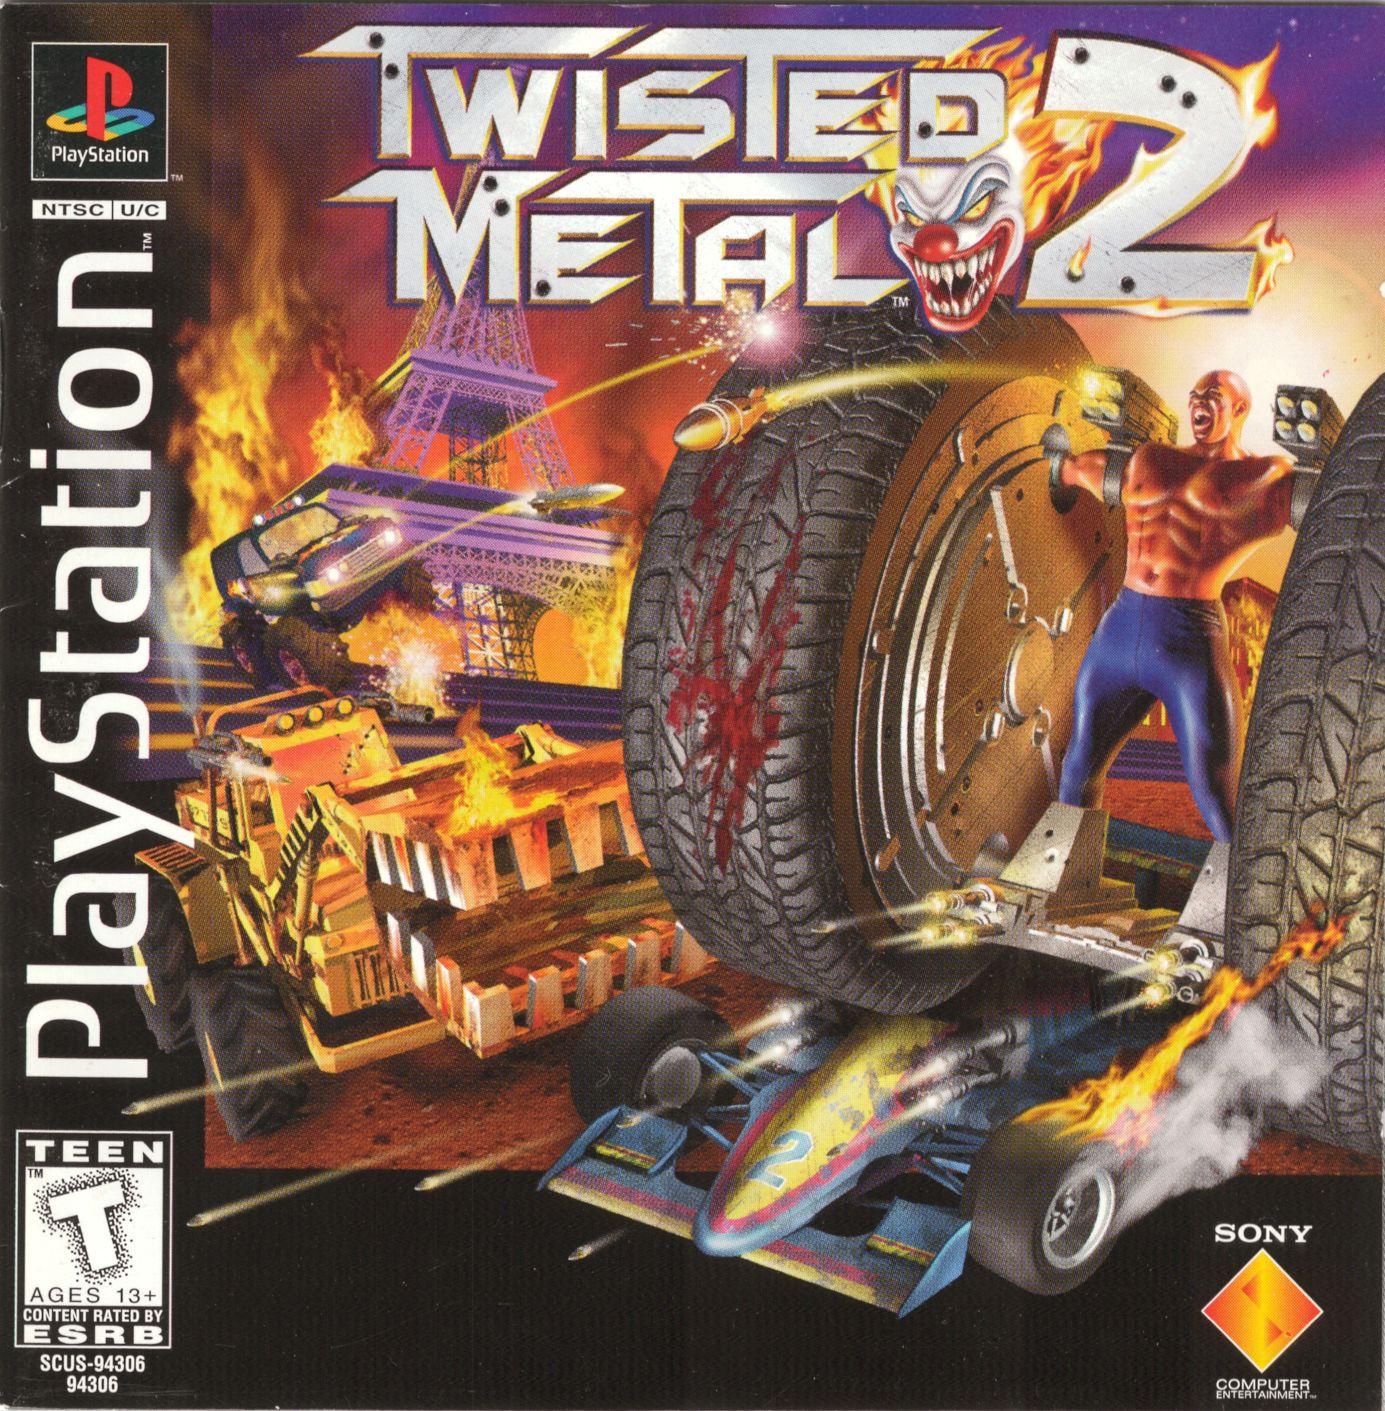 Metal Slug - Super Vehicle-001 ROM - Playstation (PS1) | Emulator Games